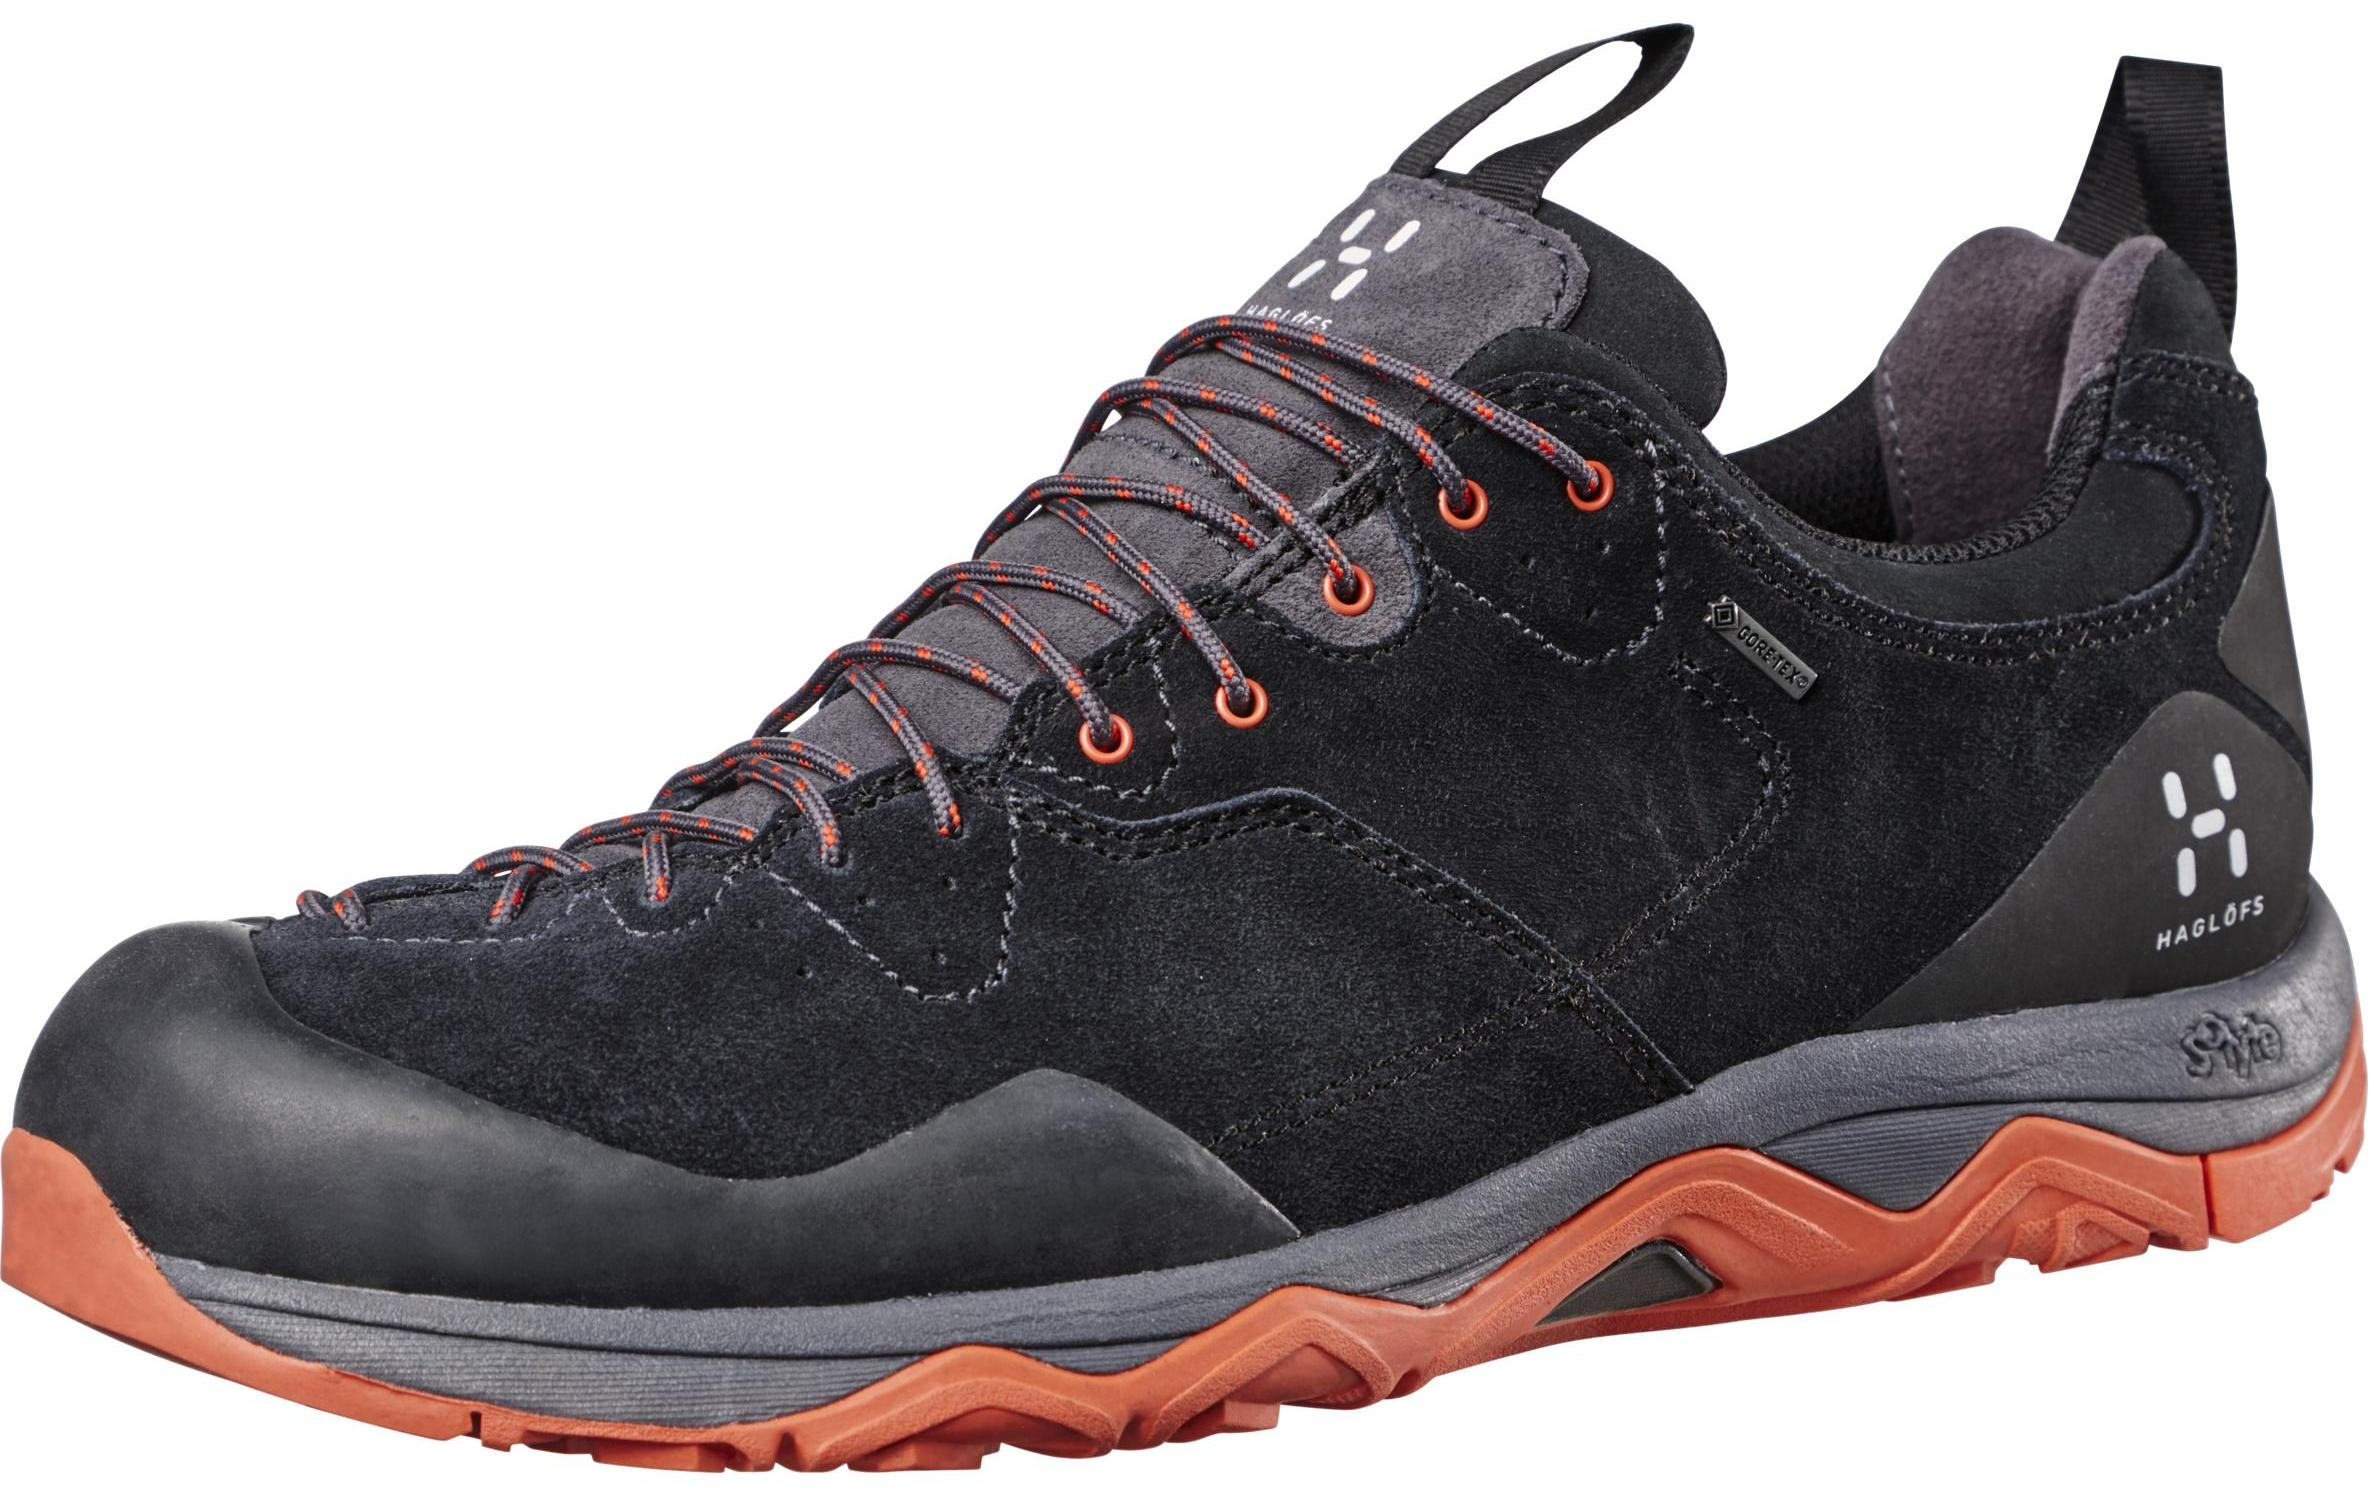 HAGLOFS 休閒鞋/登山鞋/防水健行鞋Rocker Leather GT 瑞典 男款Gore-tex鞋 491660-2FA 鋼琴黑/火焰紅